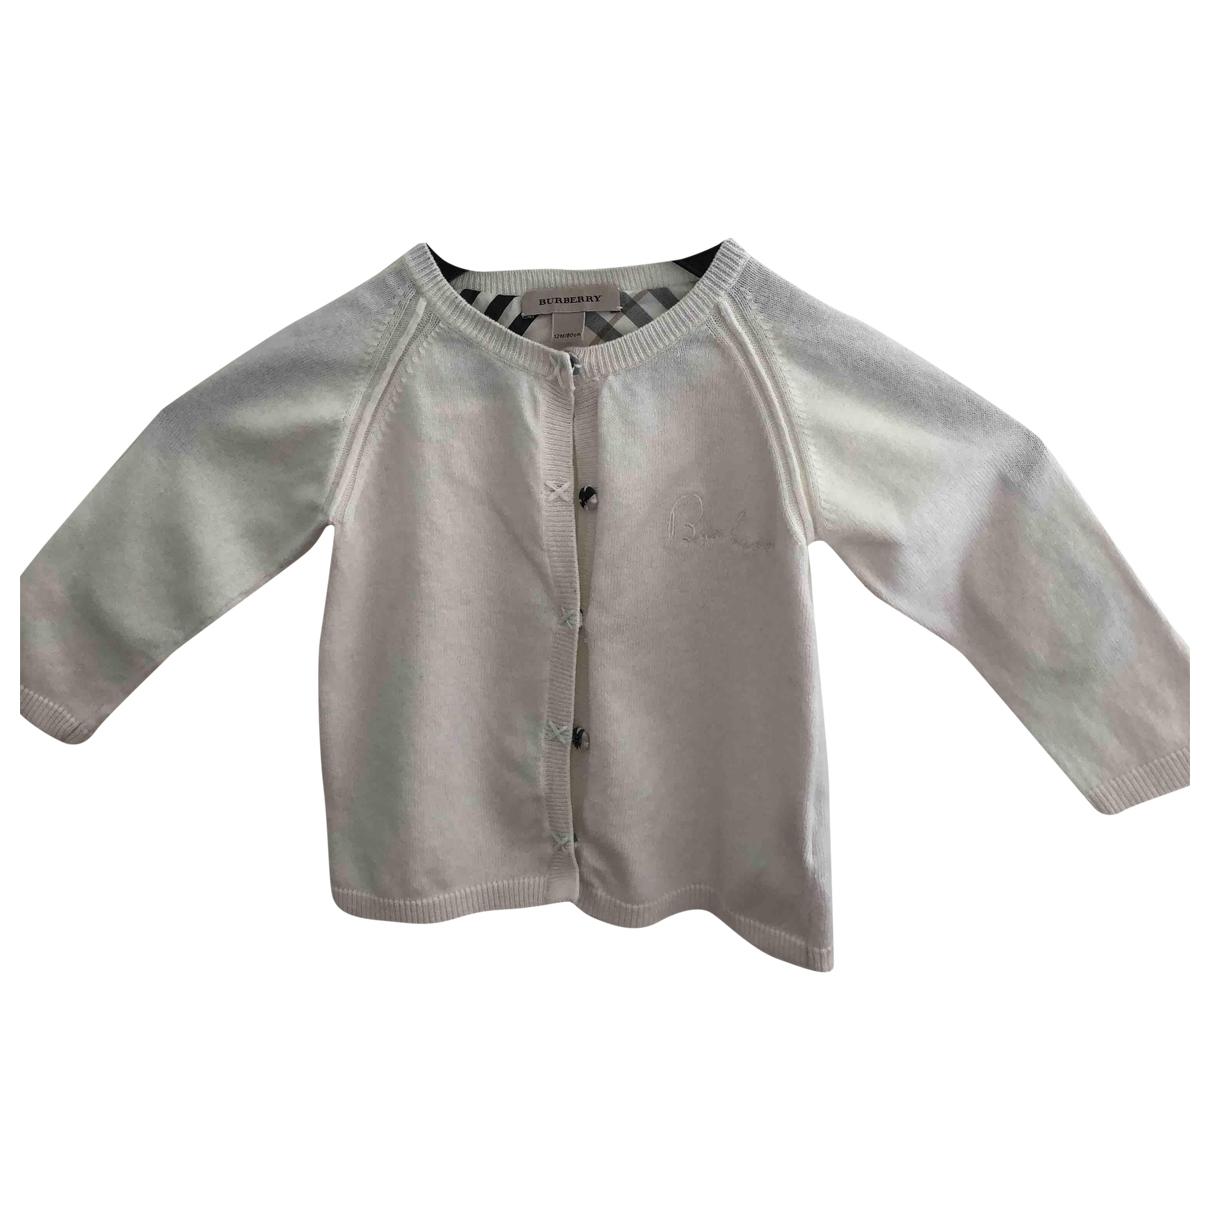 Burberry \N Ecru Wool Knitwear for Kids 12 months - up to 74cm FR